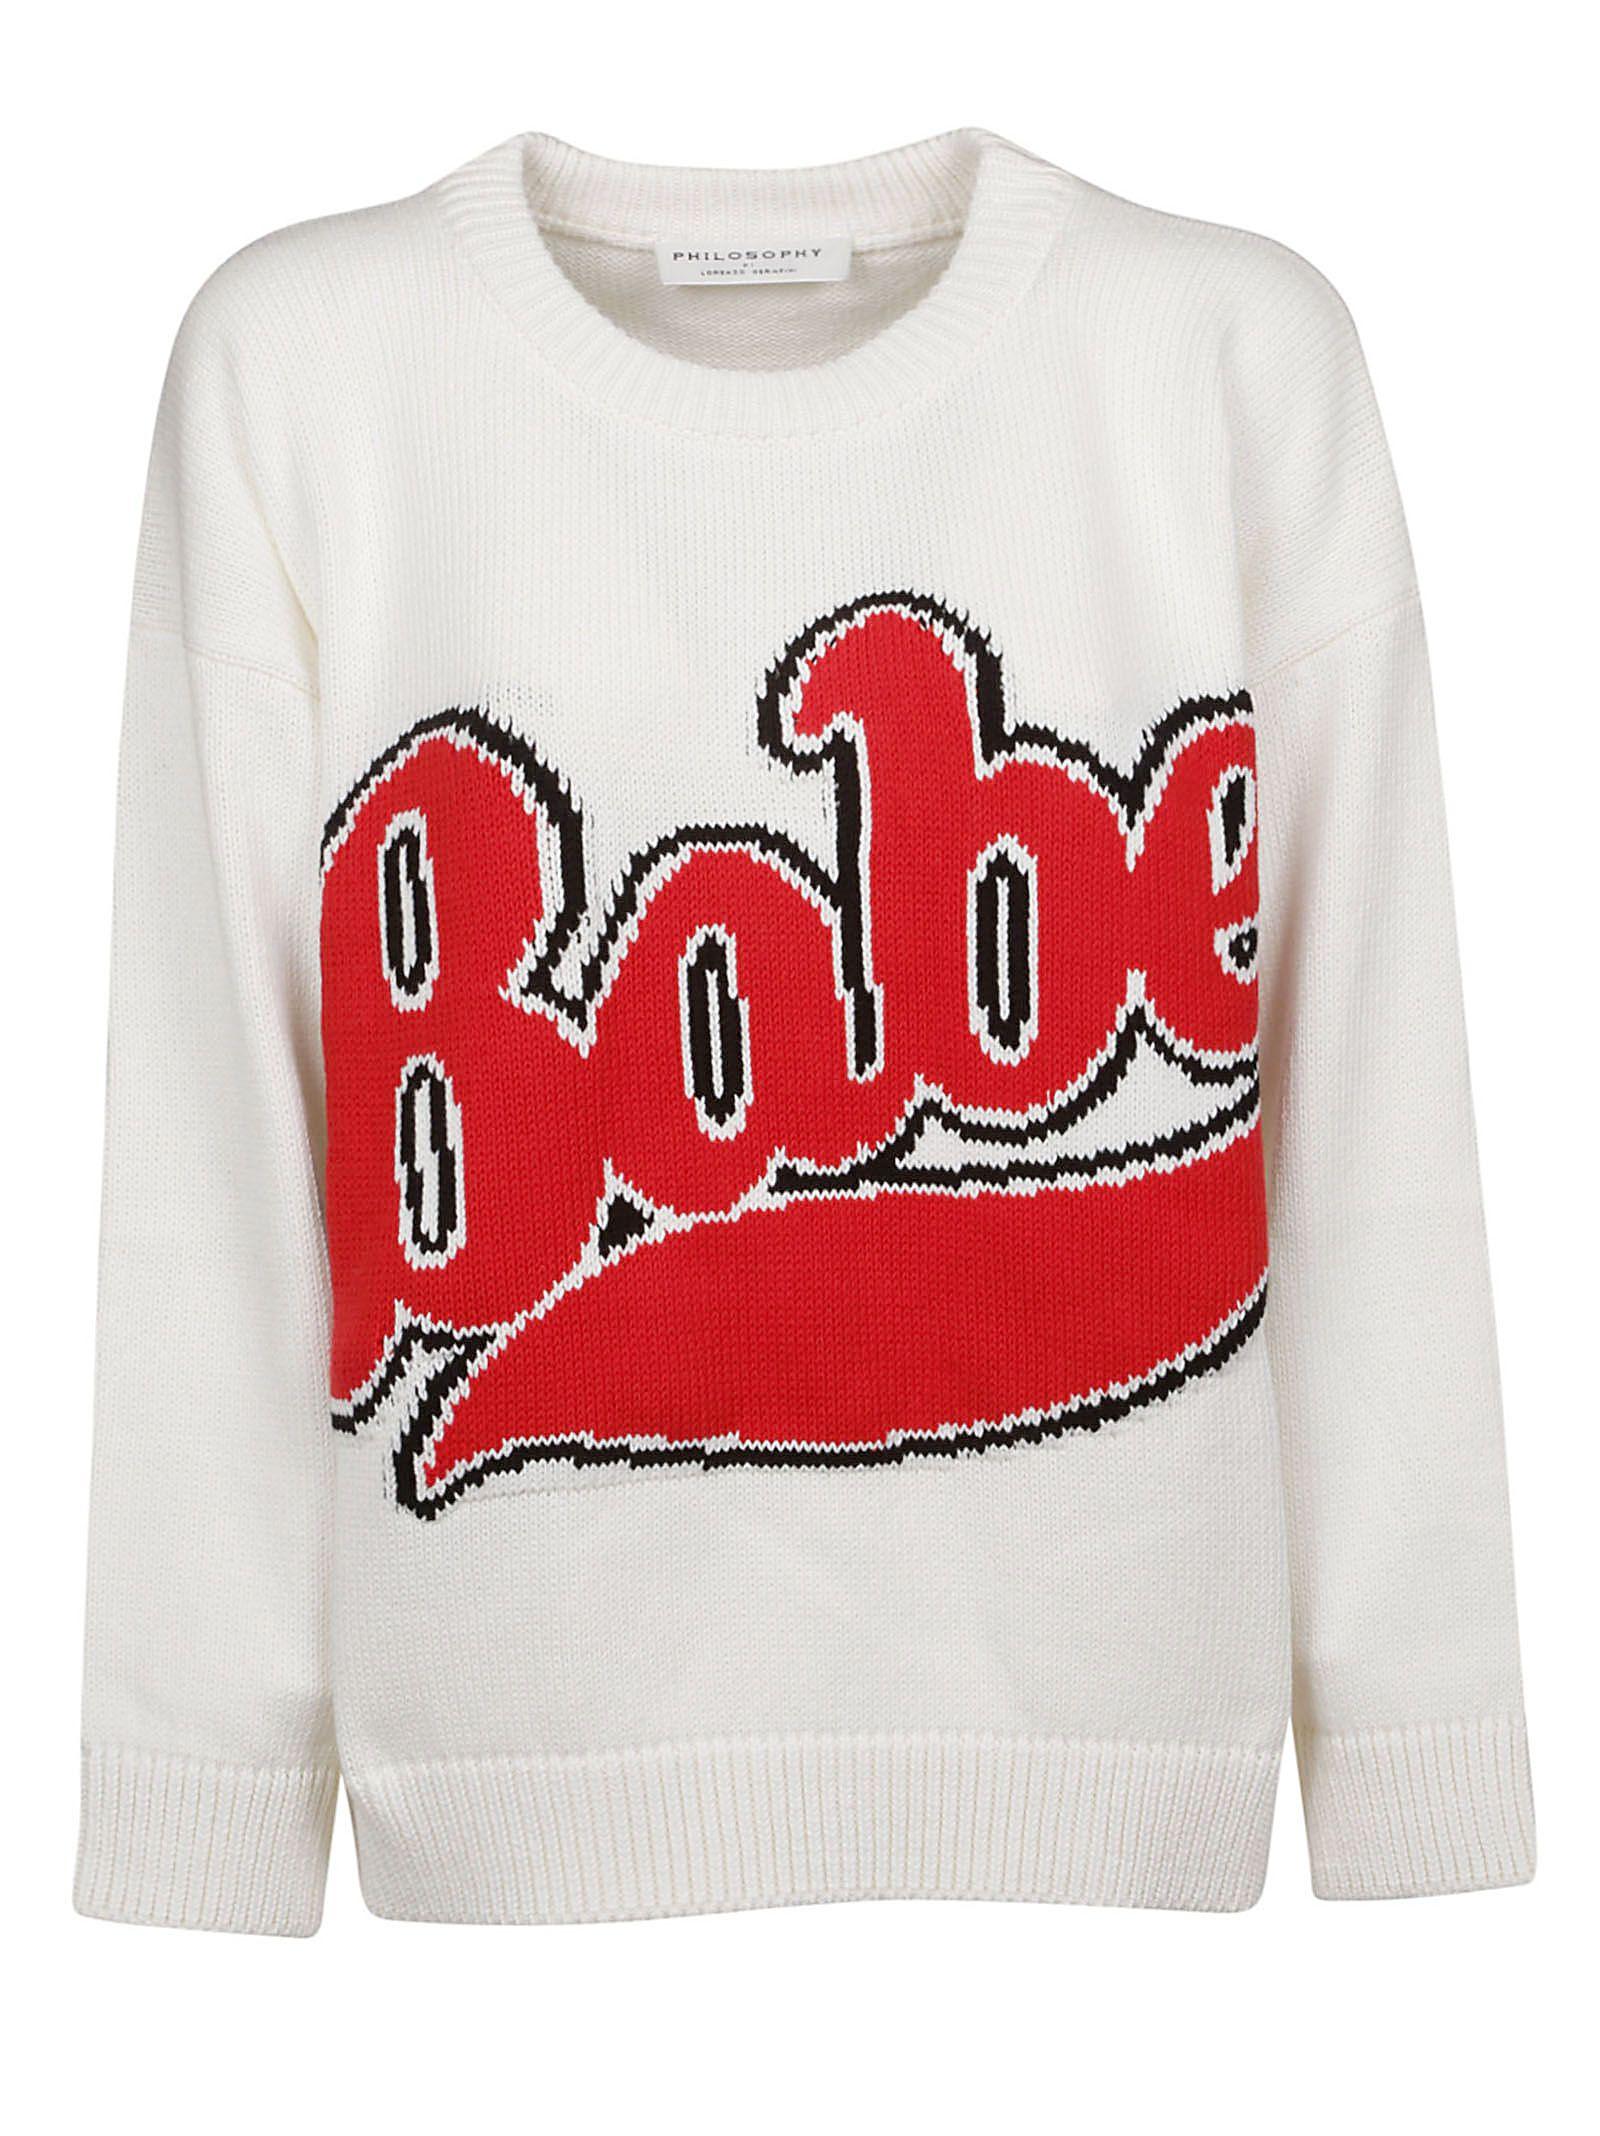 Philosophy Women's White Cotton Sweater